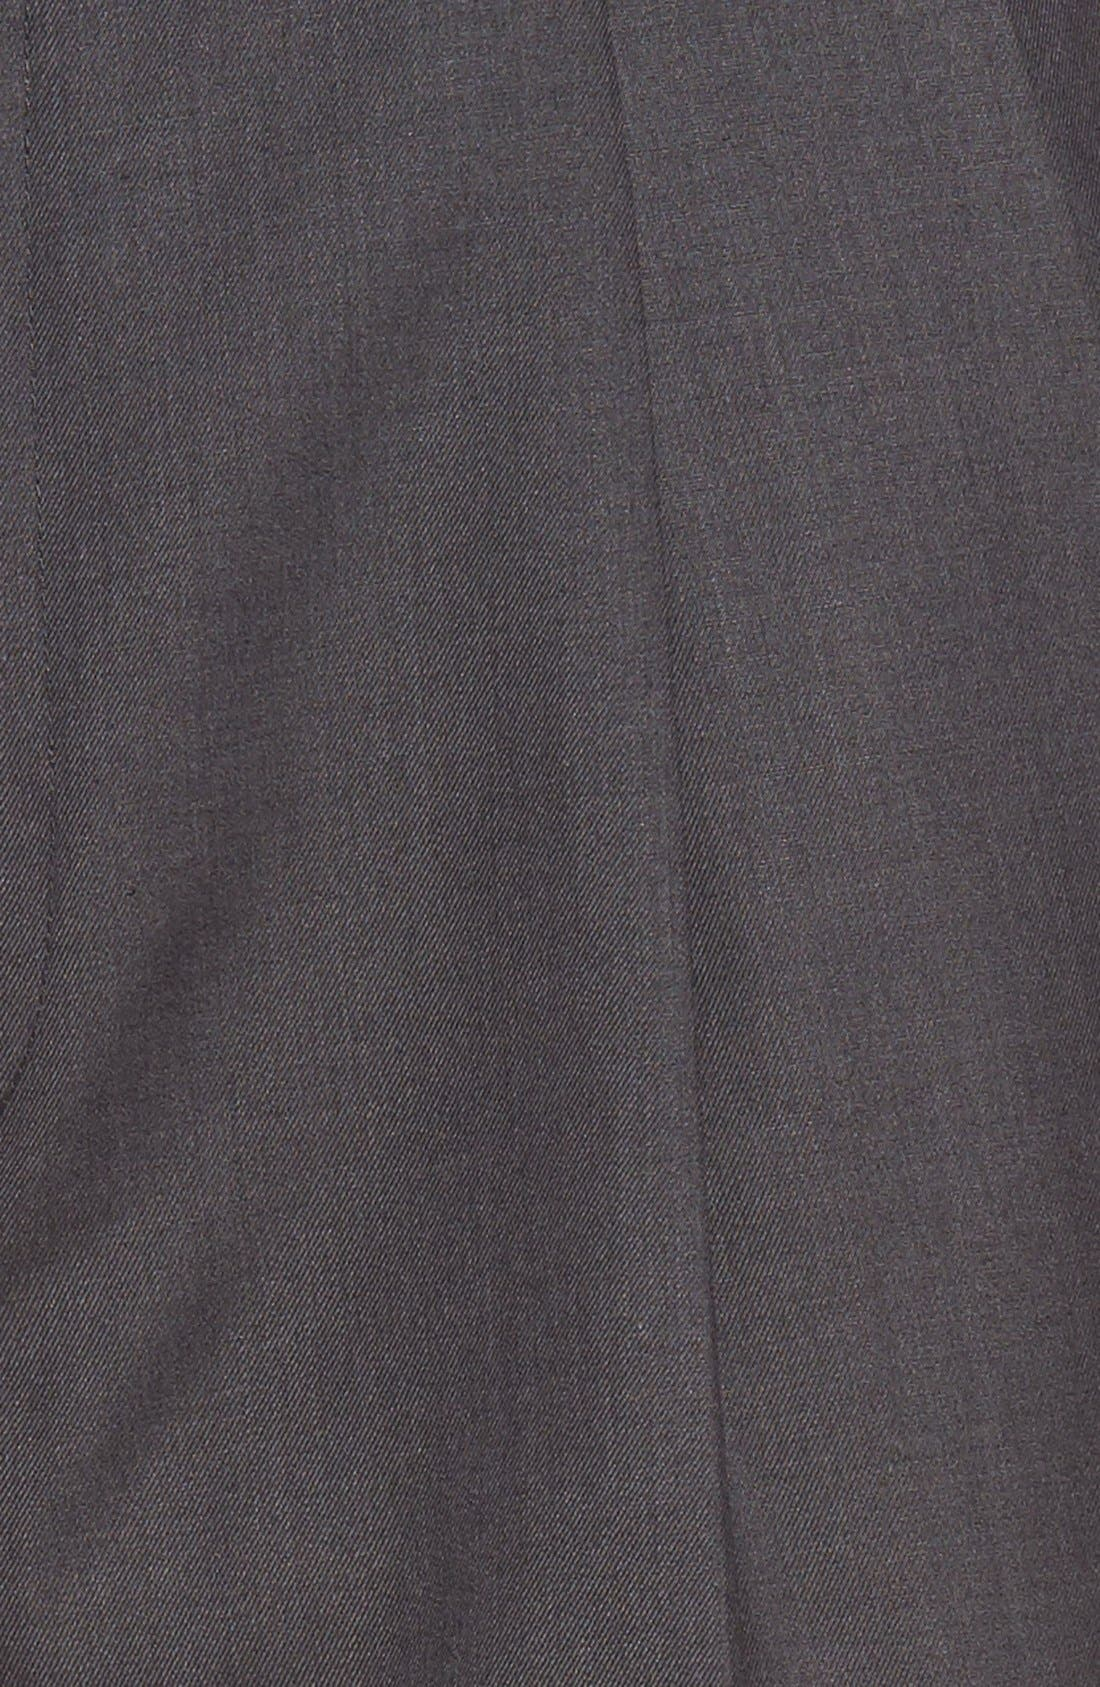 Pleated Microfiber Dress Pants,                             Alternate thumbnail 8, color,